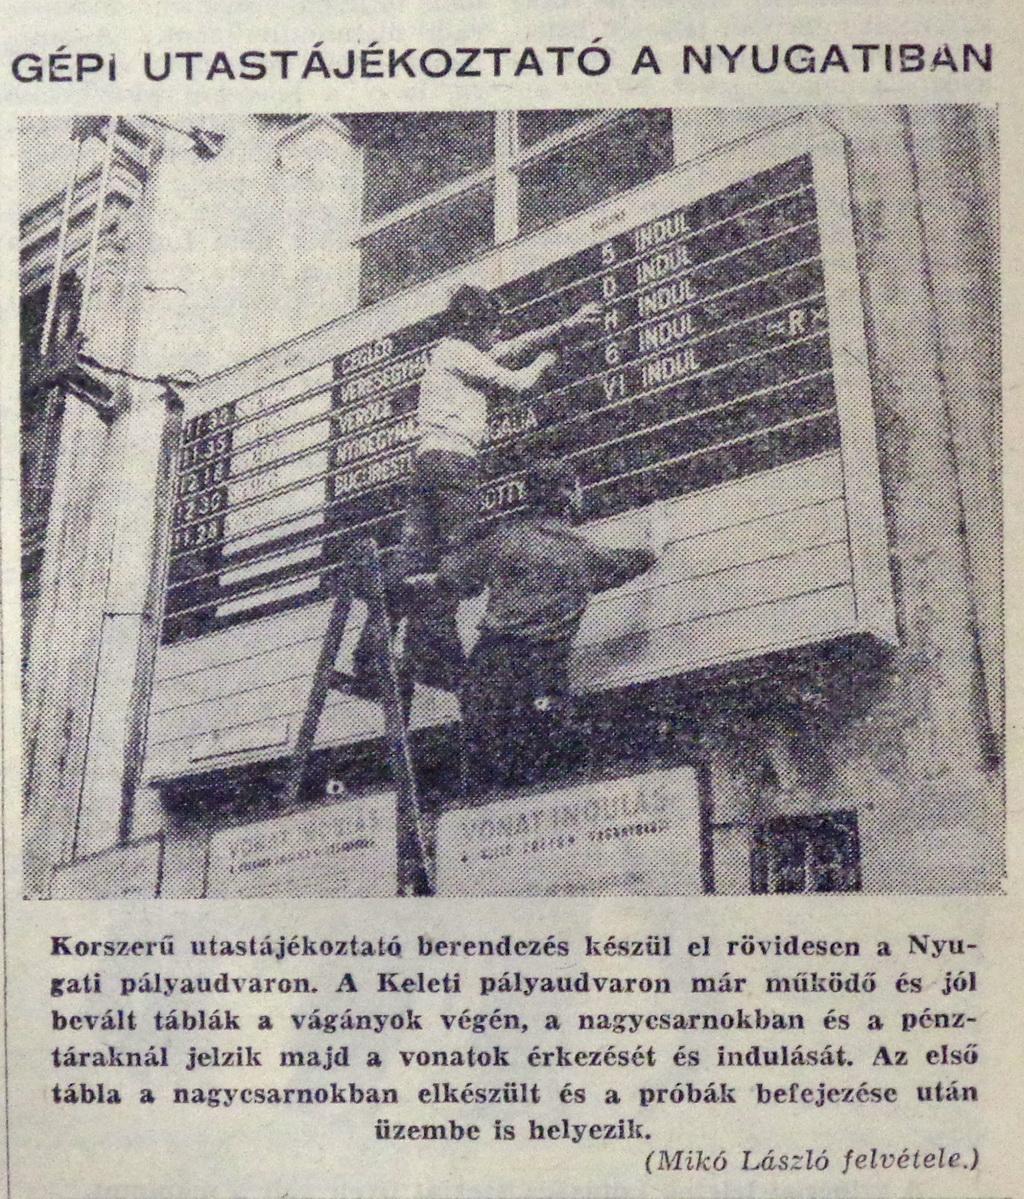 nyugatipalyaudvar-19710720-nepszabadsag.jpg